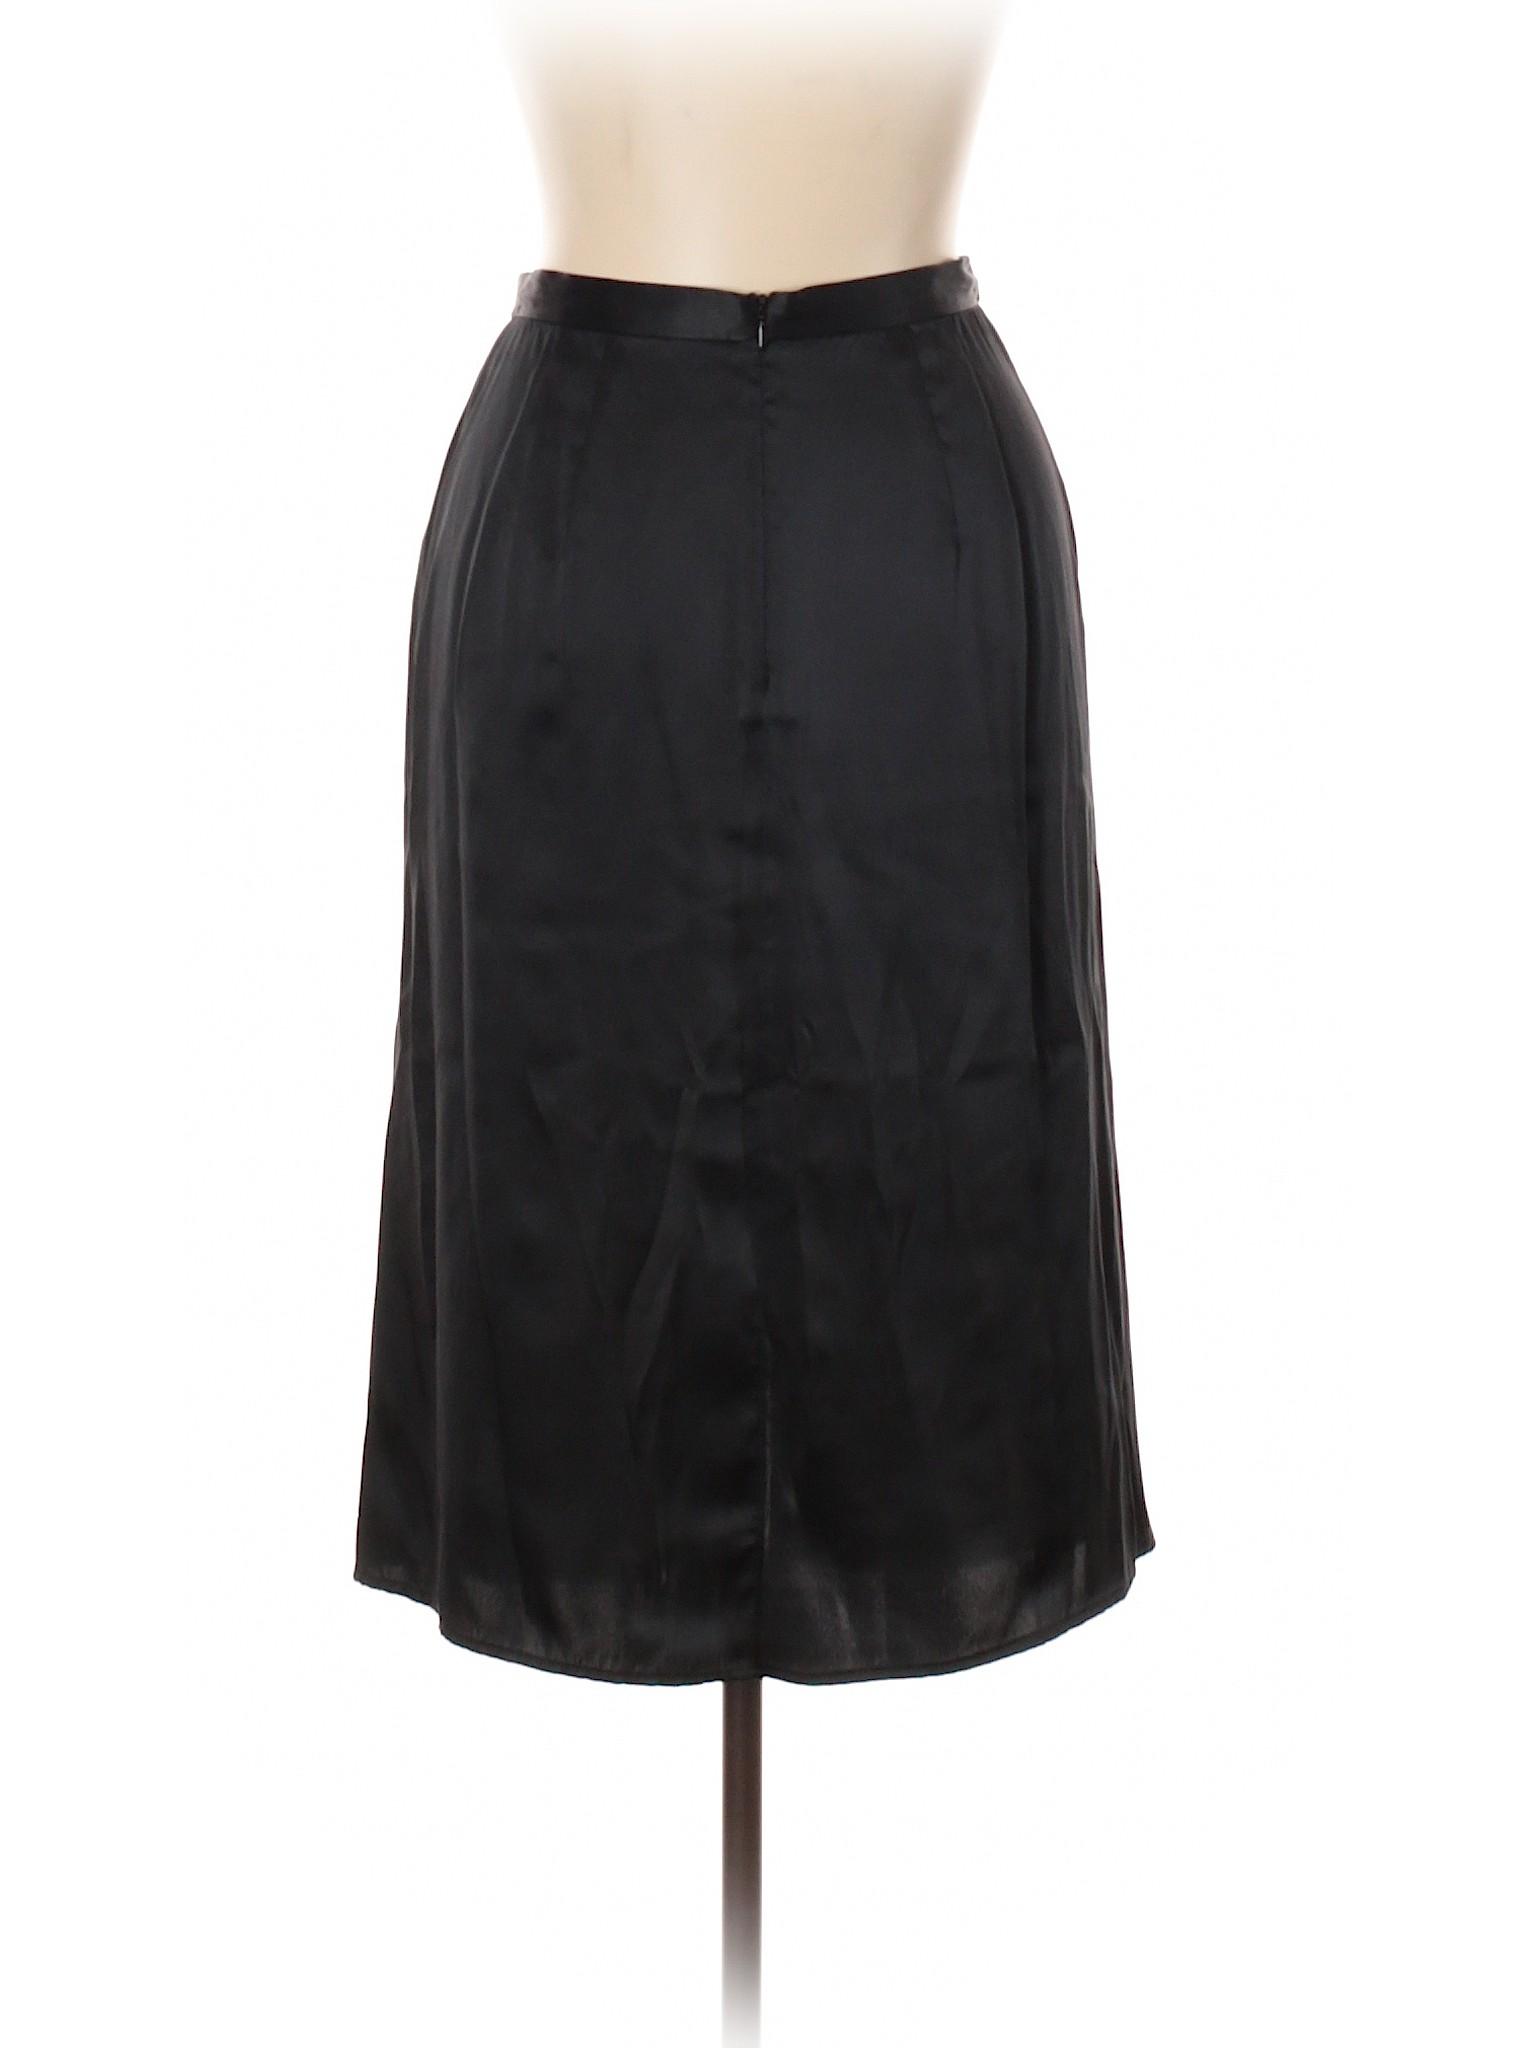 Boutique Skirt Skirt Silk Silk Silk Boutique Boutique Cgfwq1